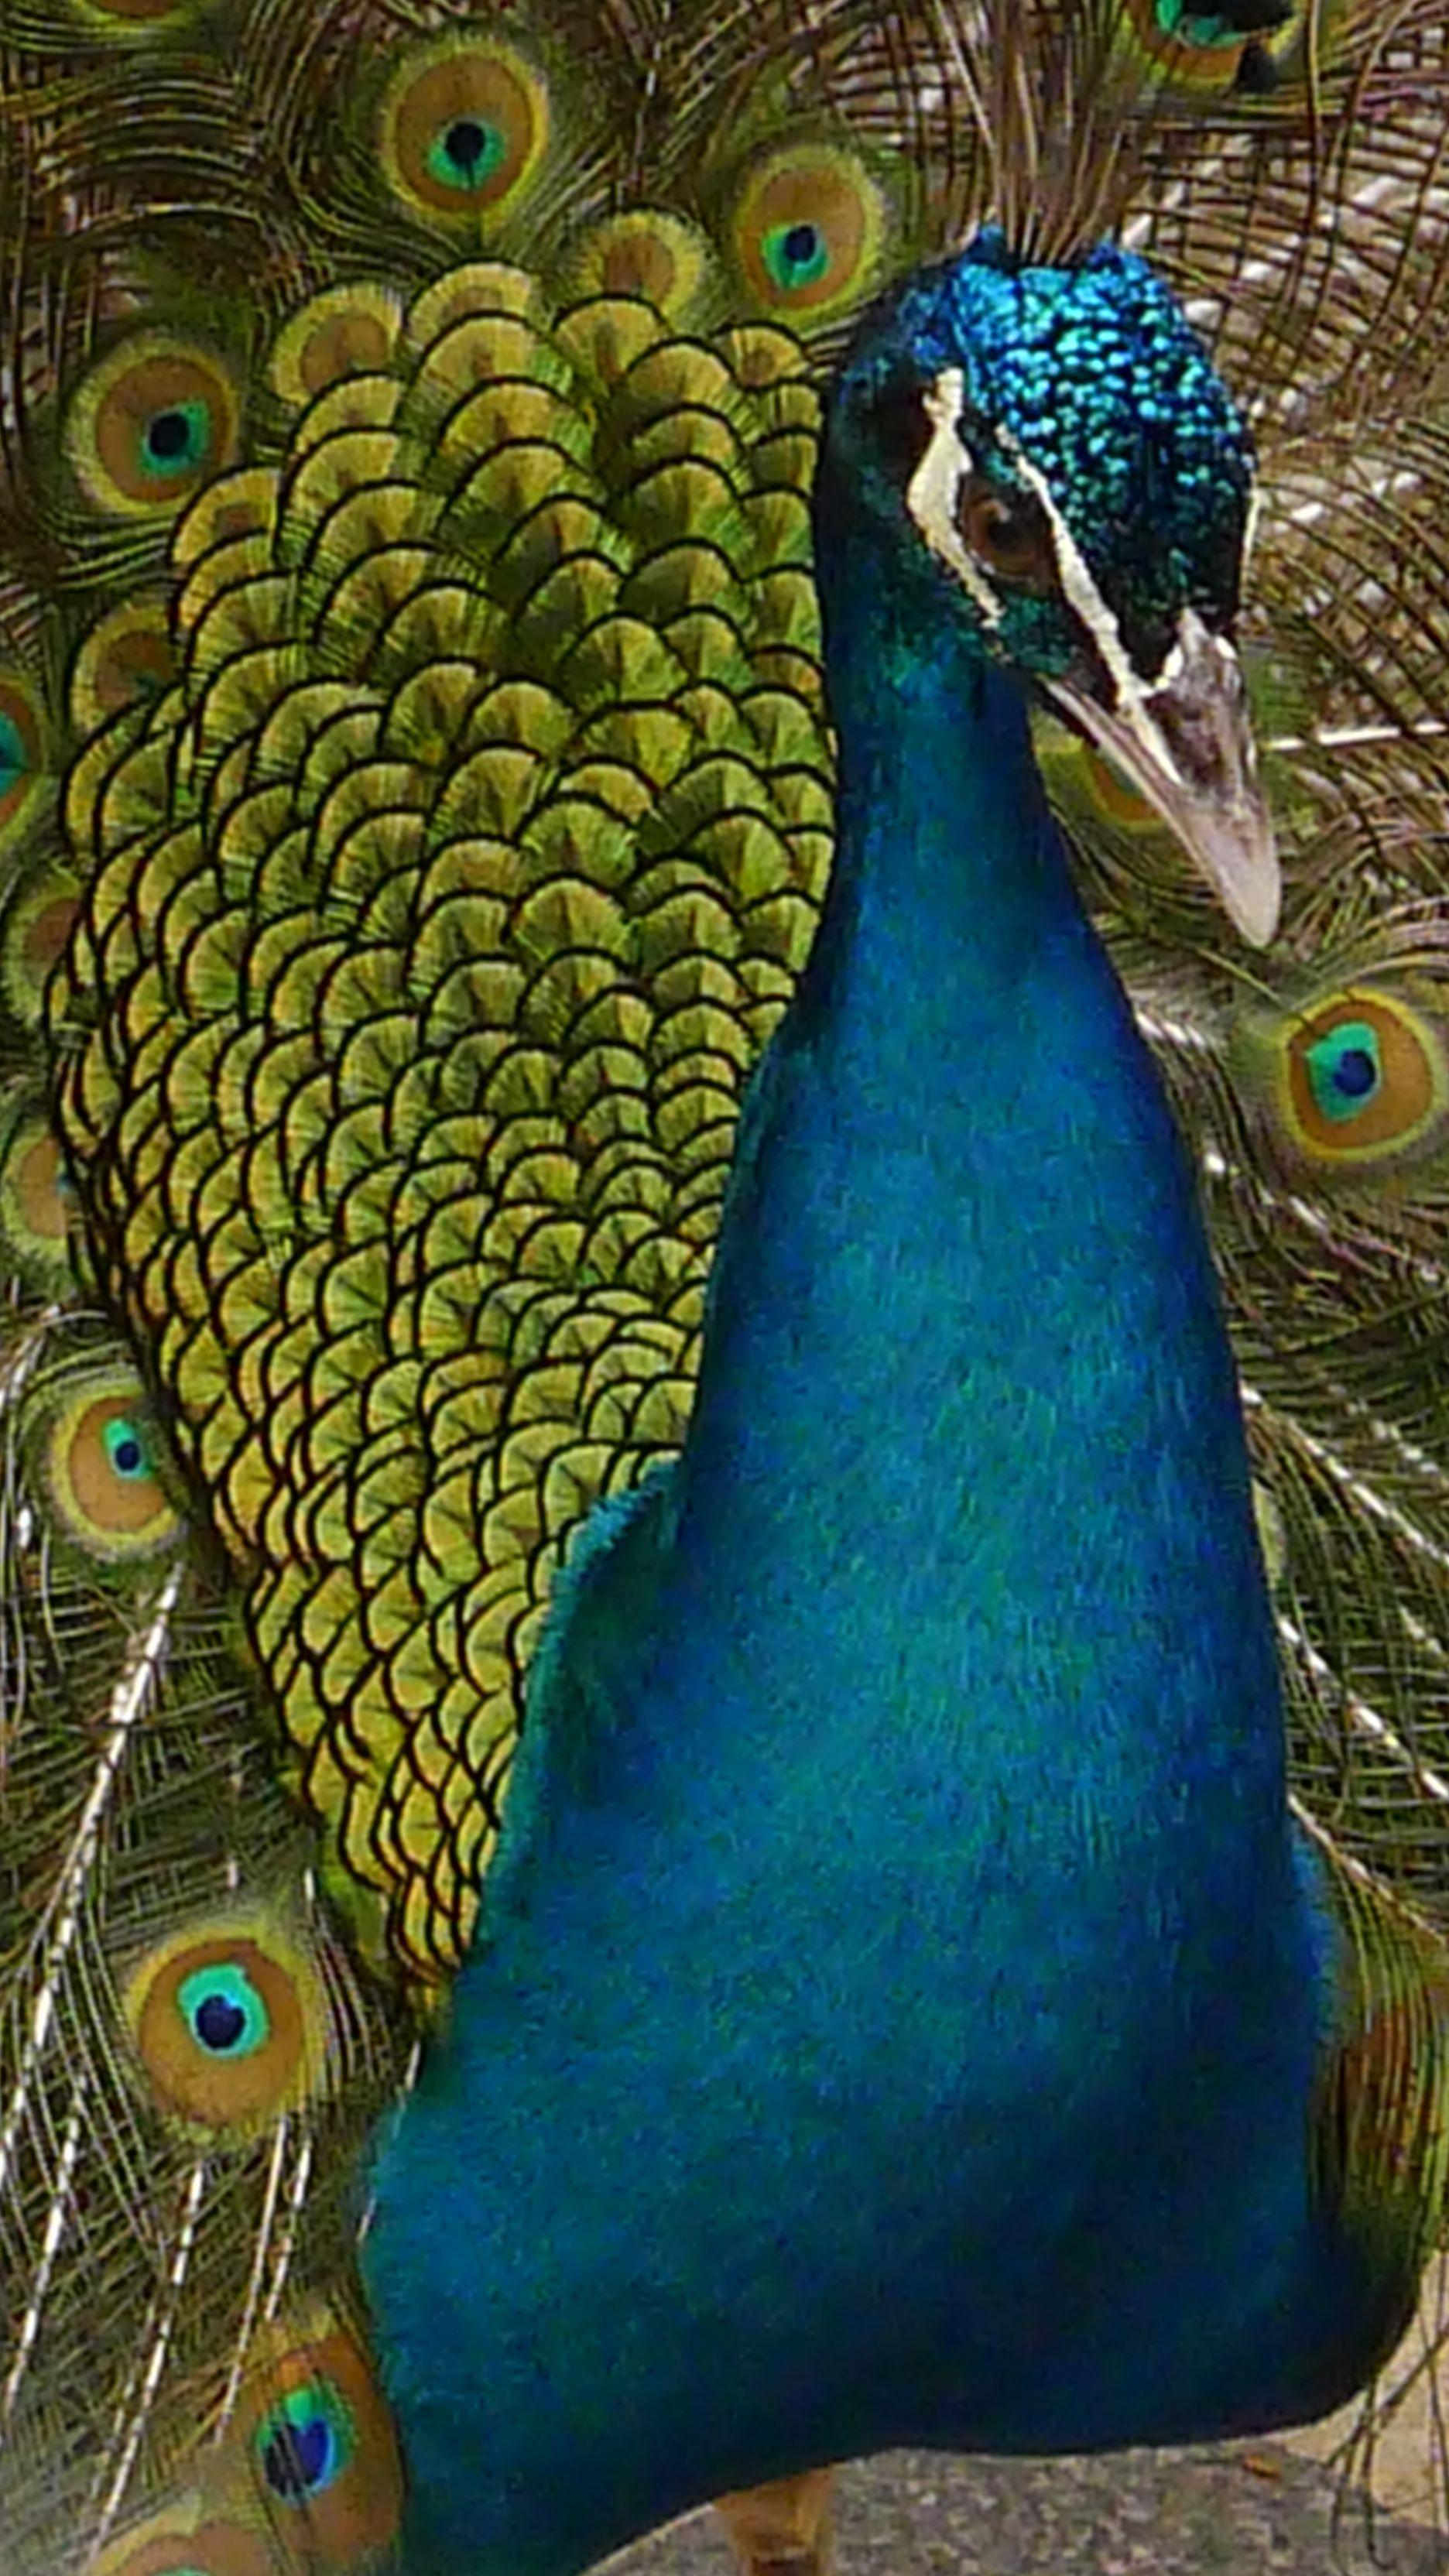 Peacock at the Seac Pai Van Park - Photo Taken by BradJill